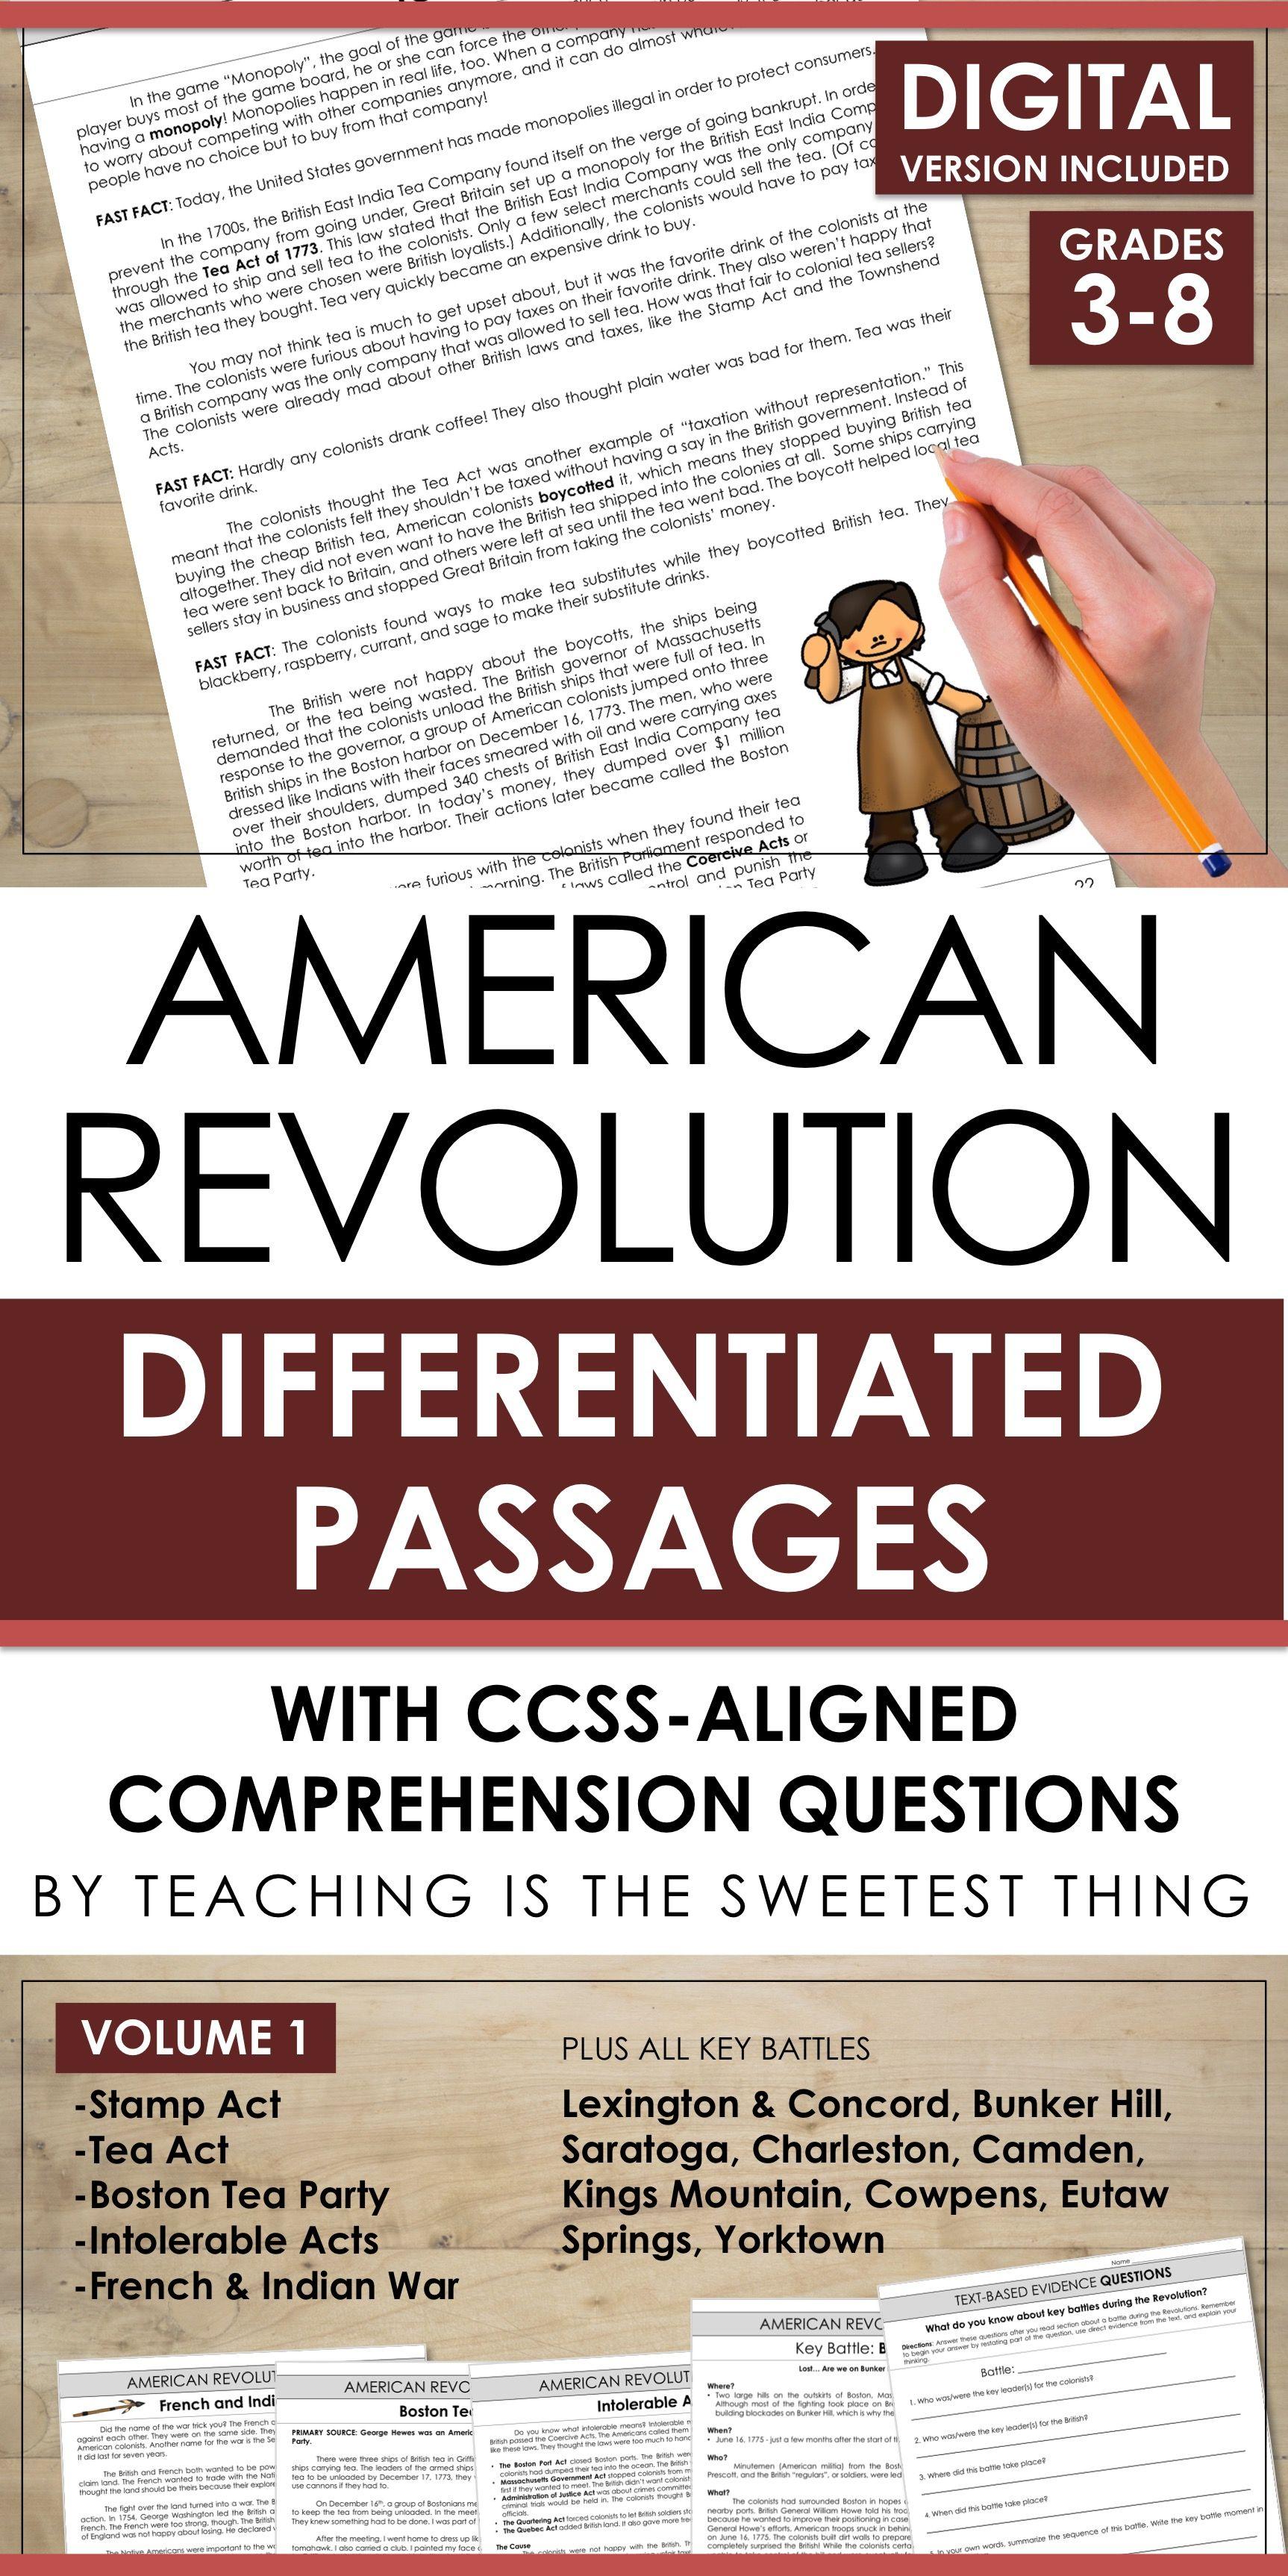 American Revolution Vol 1 Passages